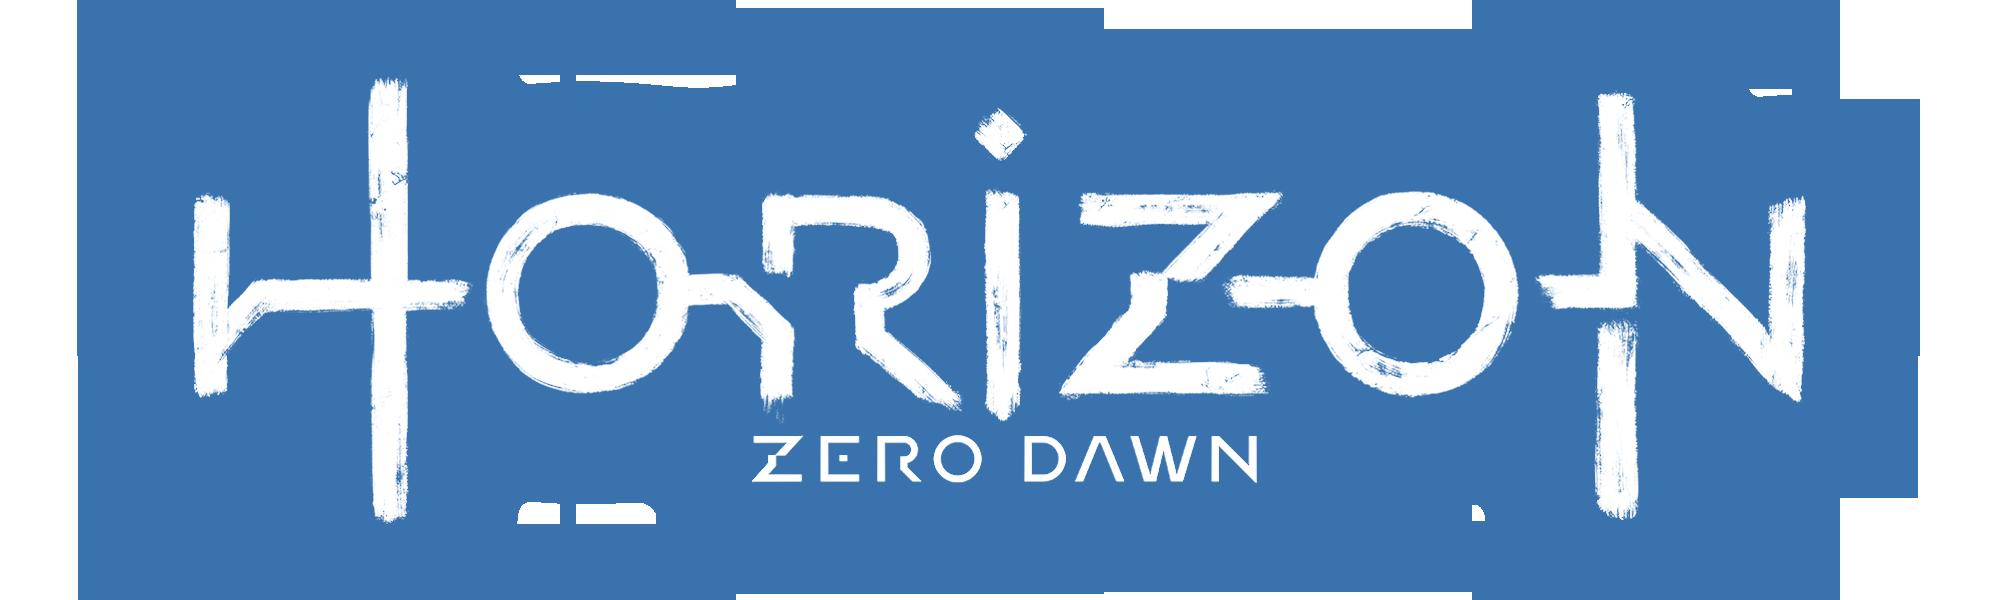 Horizon zero dawn logo clipart graphic royalty free Horizon Zero Dawn - Guerrilla graphic royalty free